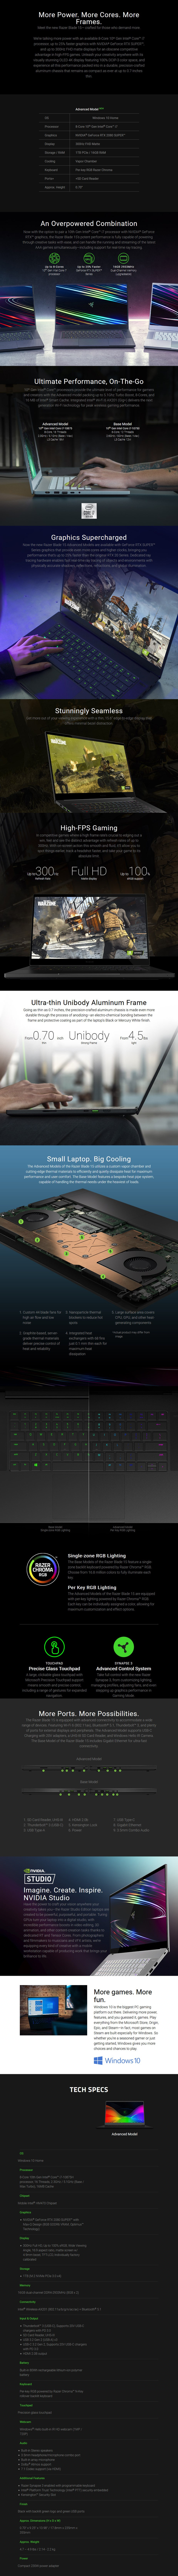 "Razer Blade 15 Advanced 15.6"" 300Hz Gaming Laptop i7-10875H 16GB 1TB RTX2080S - Overview 1"